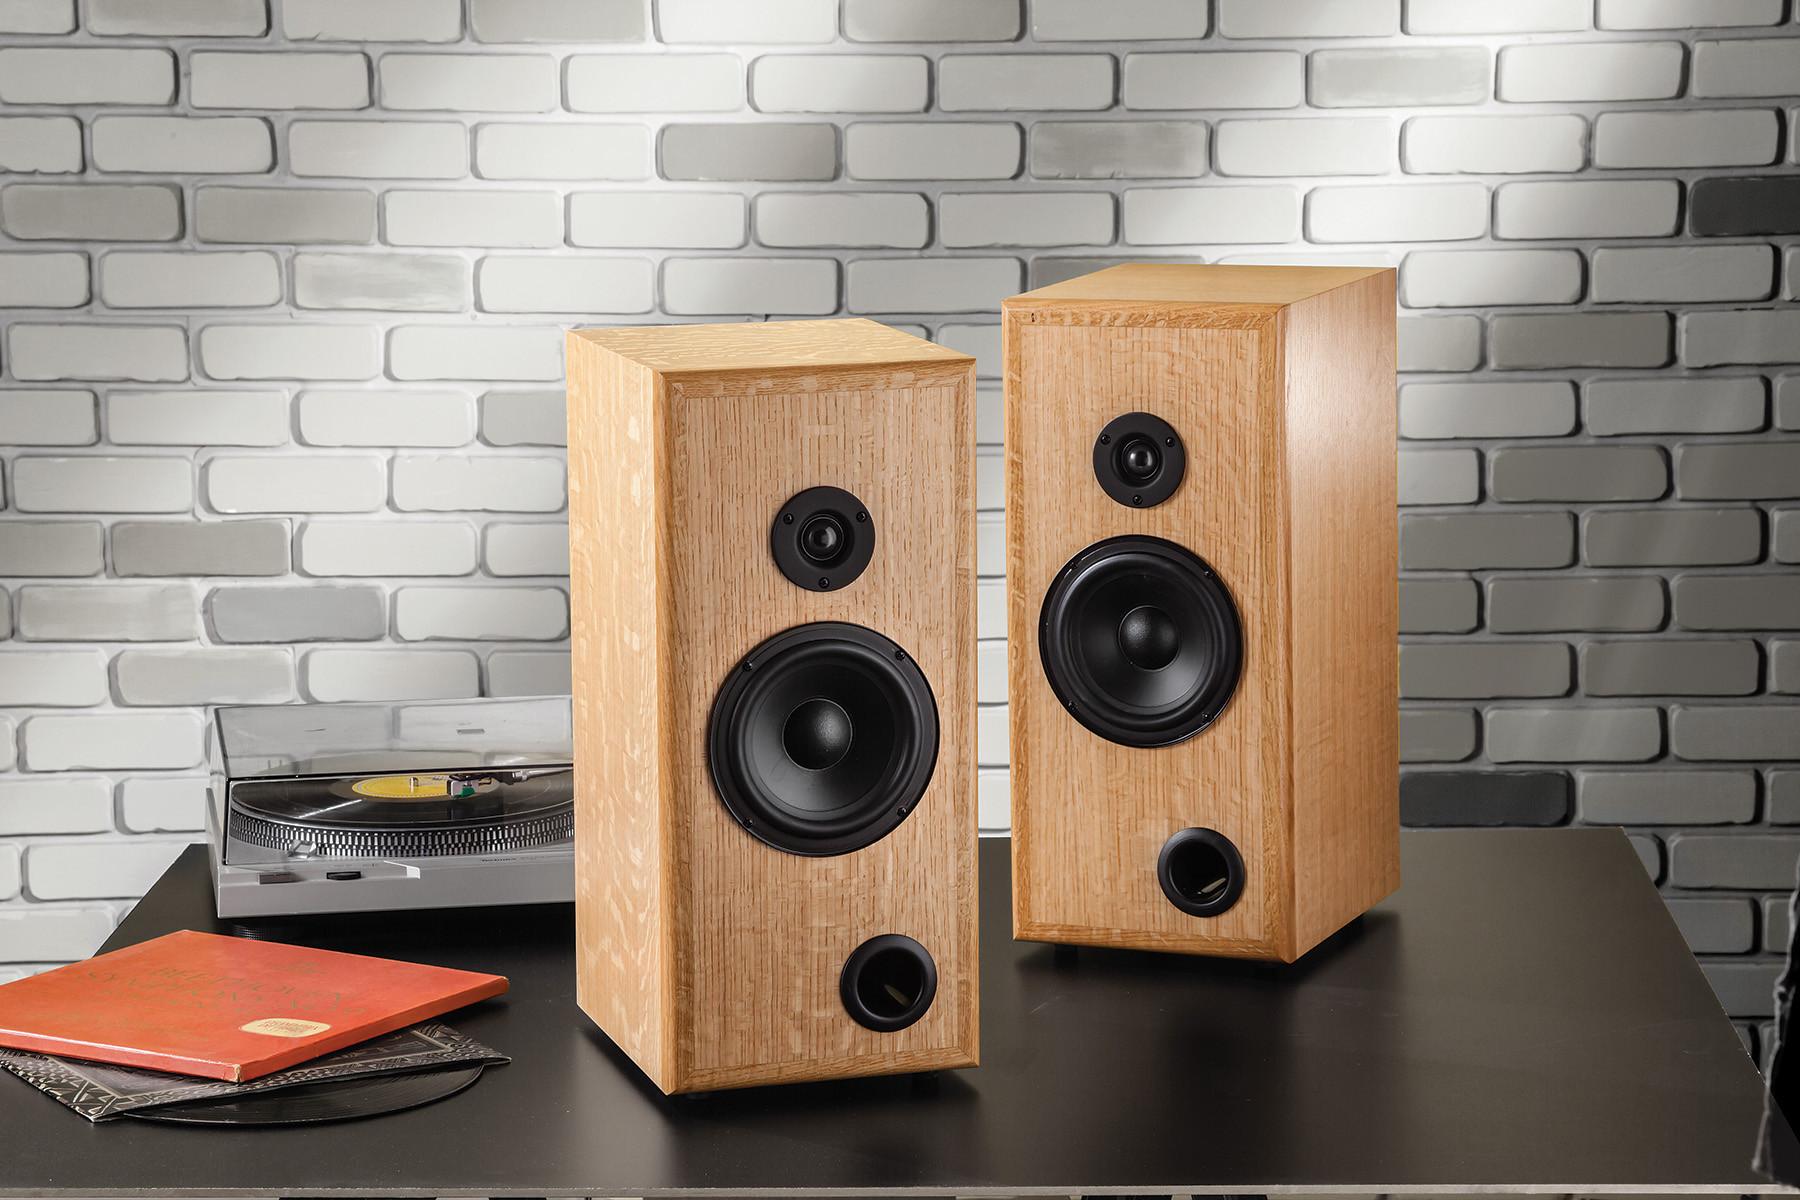 DIY Speaker Box  Rockler Introduces DIY Bookshelf Speaker Kits Users